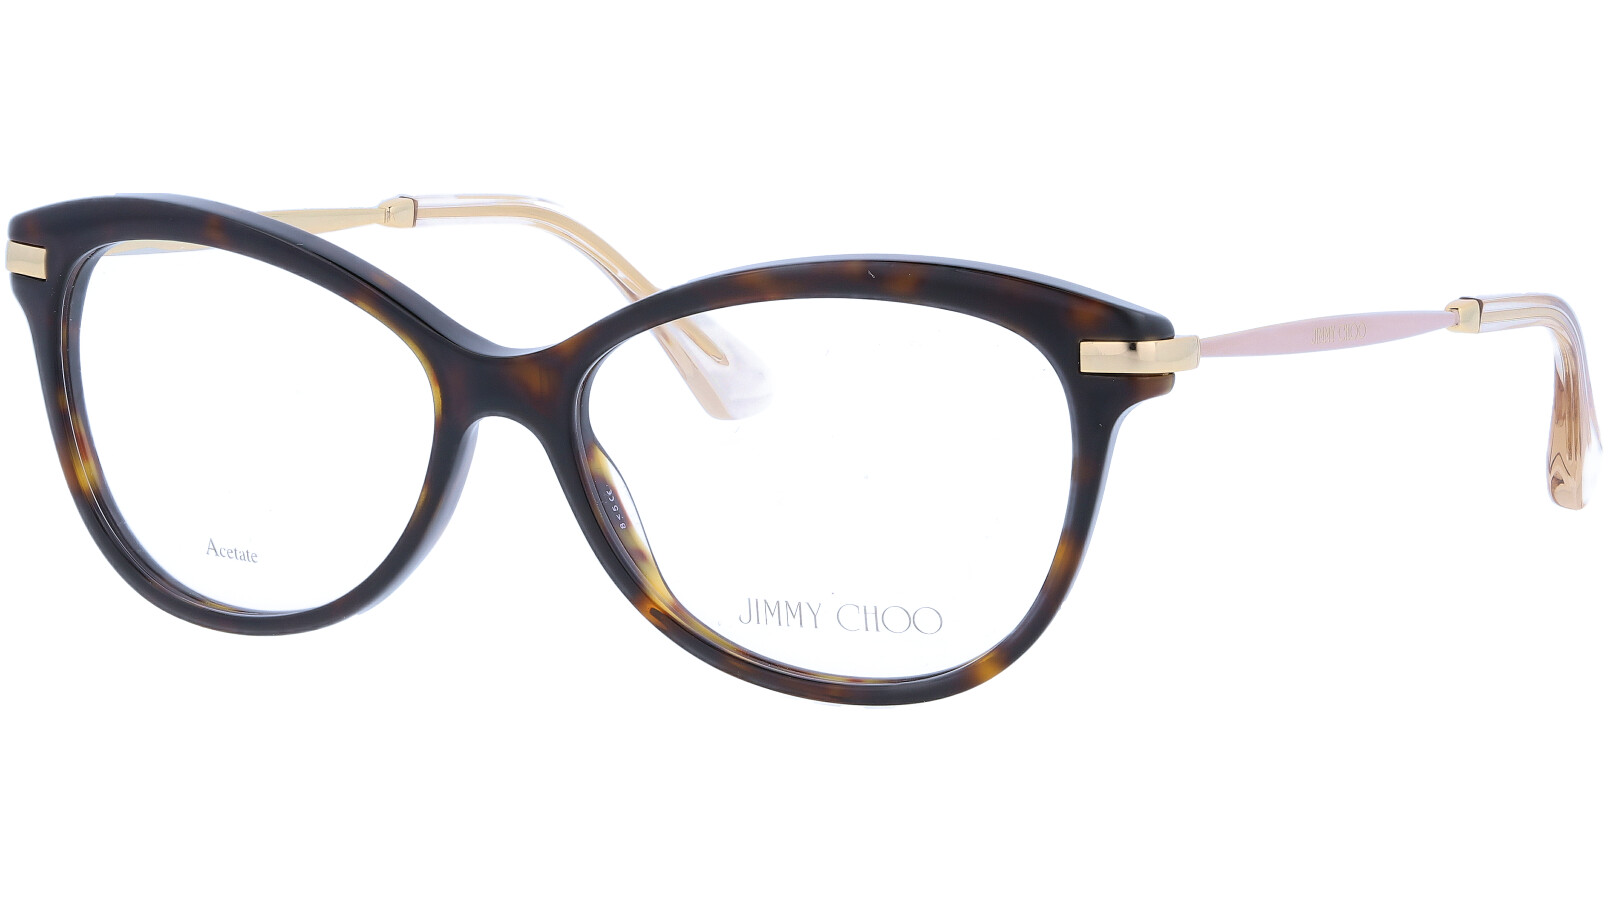 JIMMY CHOO JC95 7VI 53 DKHV Glasses